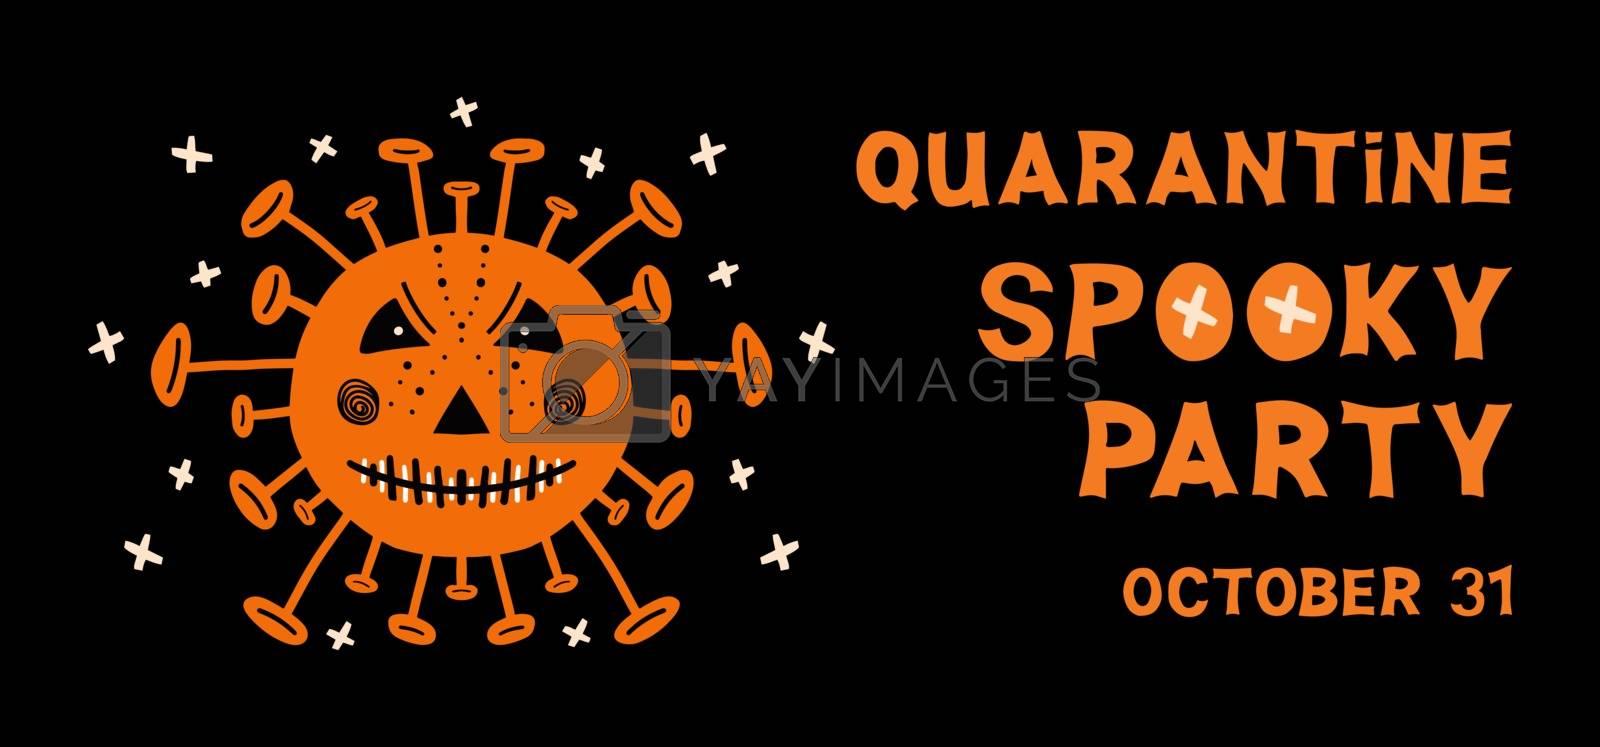 Halloween flyer. Coronavirus bacteria with scary face and orange lettering on dark background. Vector stock illustration.